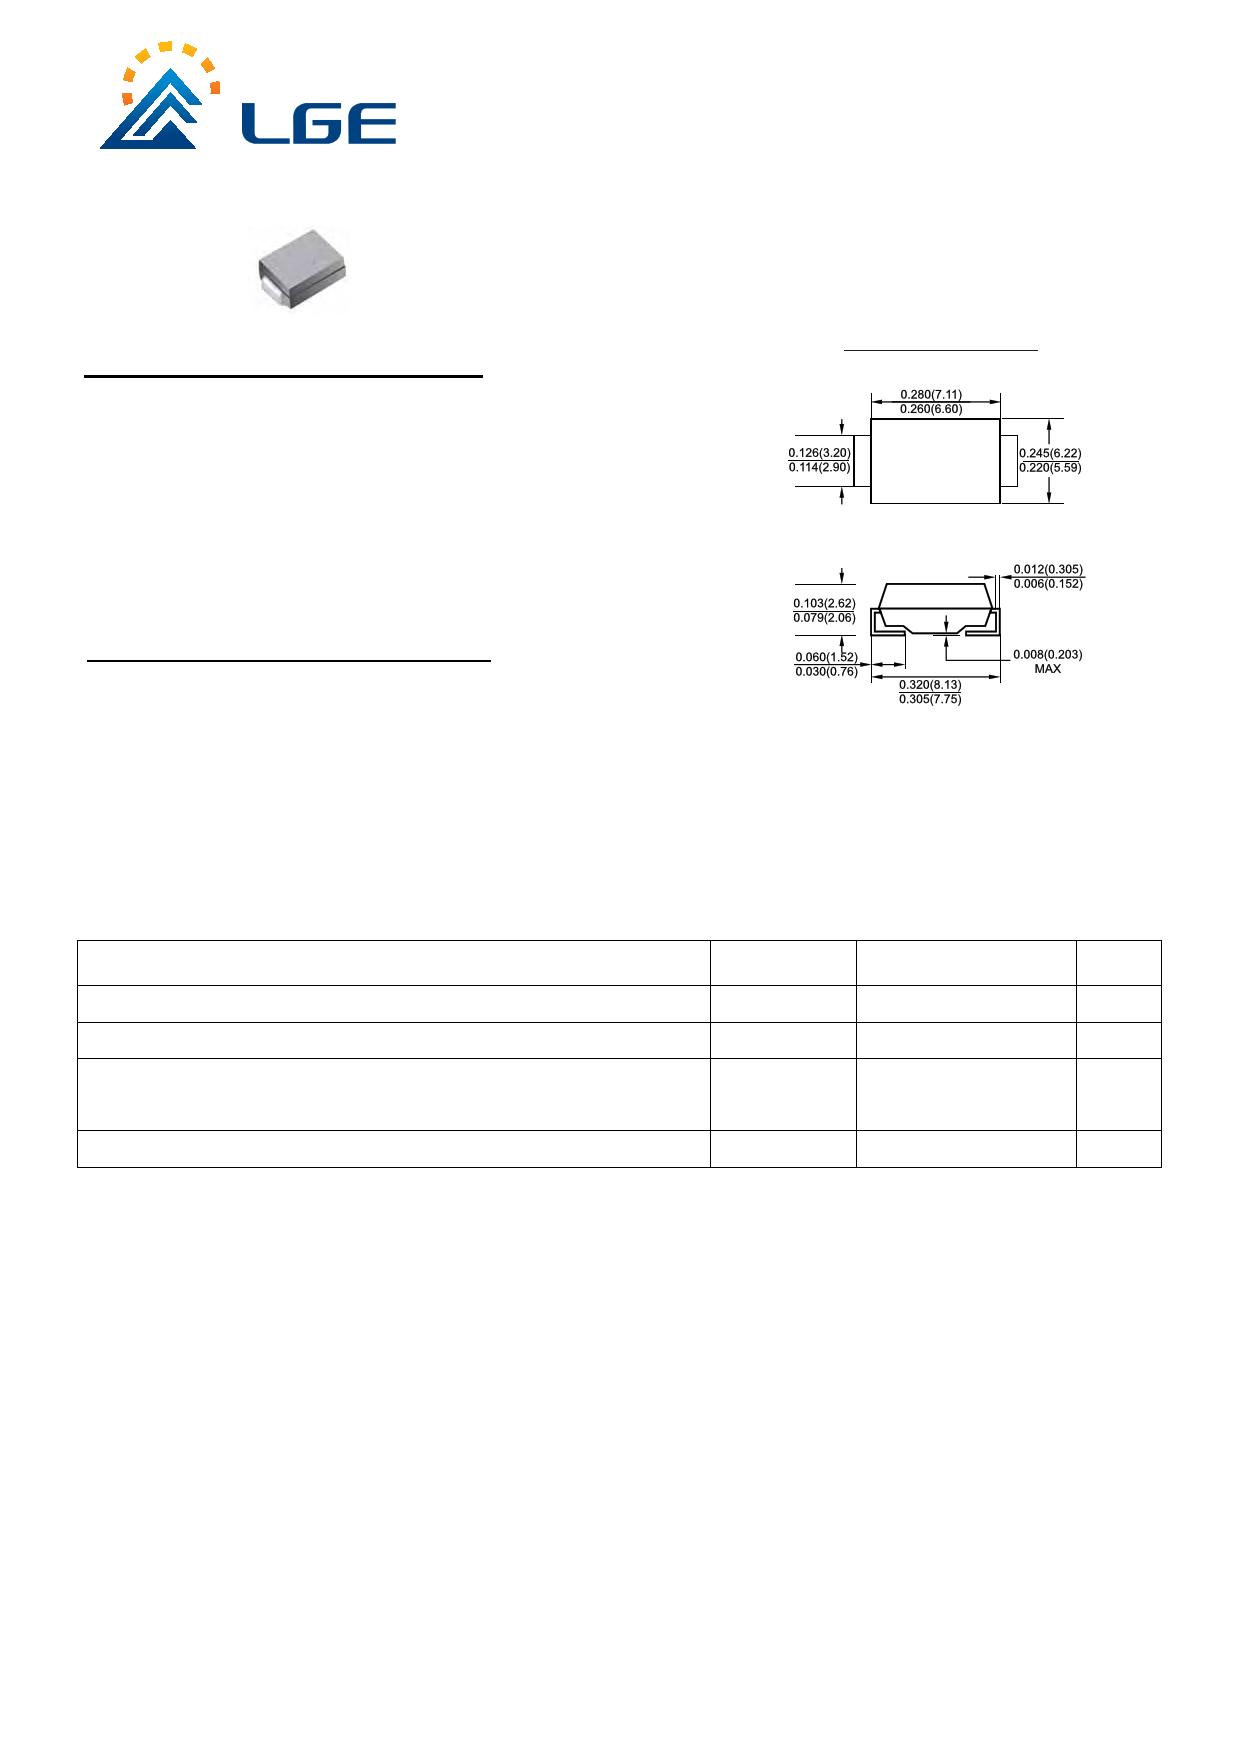 3.0SMCJ180CA Datasheet, 3.0SMCJ180CA PDF,ピン配置, 機能